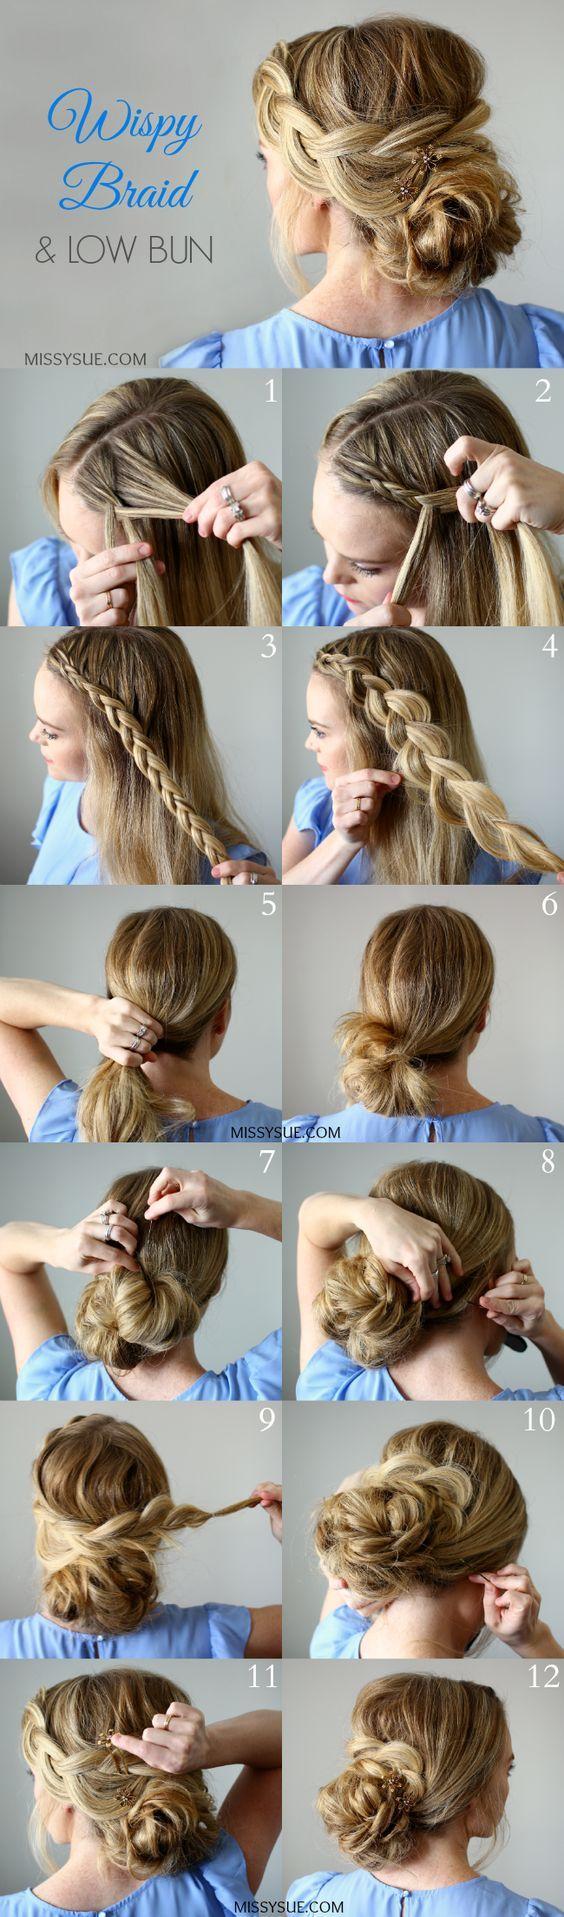 best easy hairdos images on pinterest